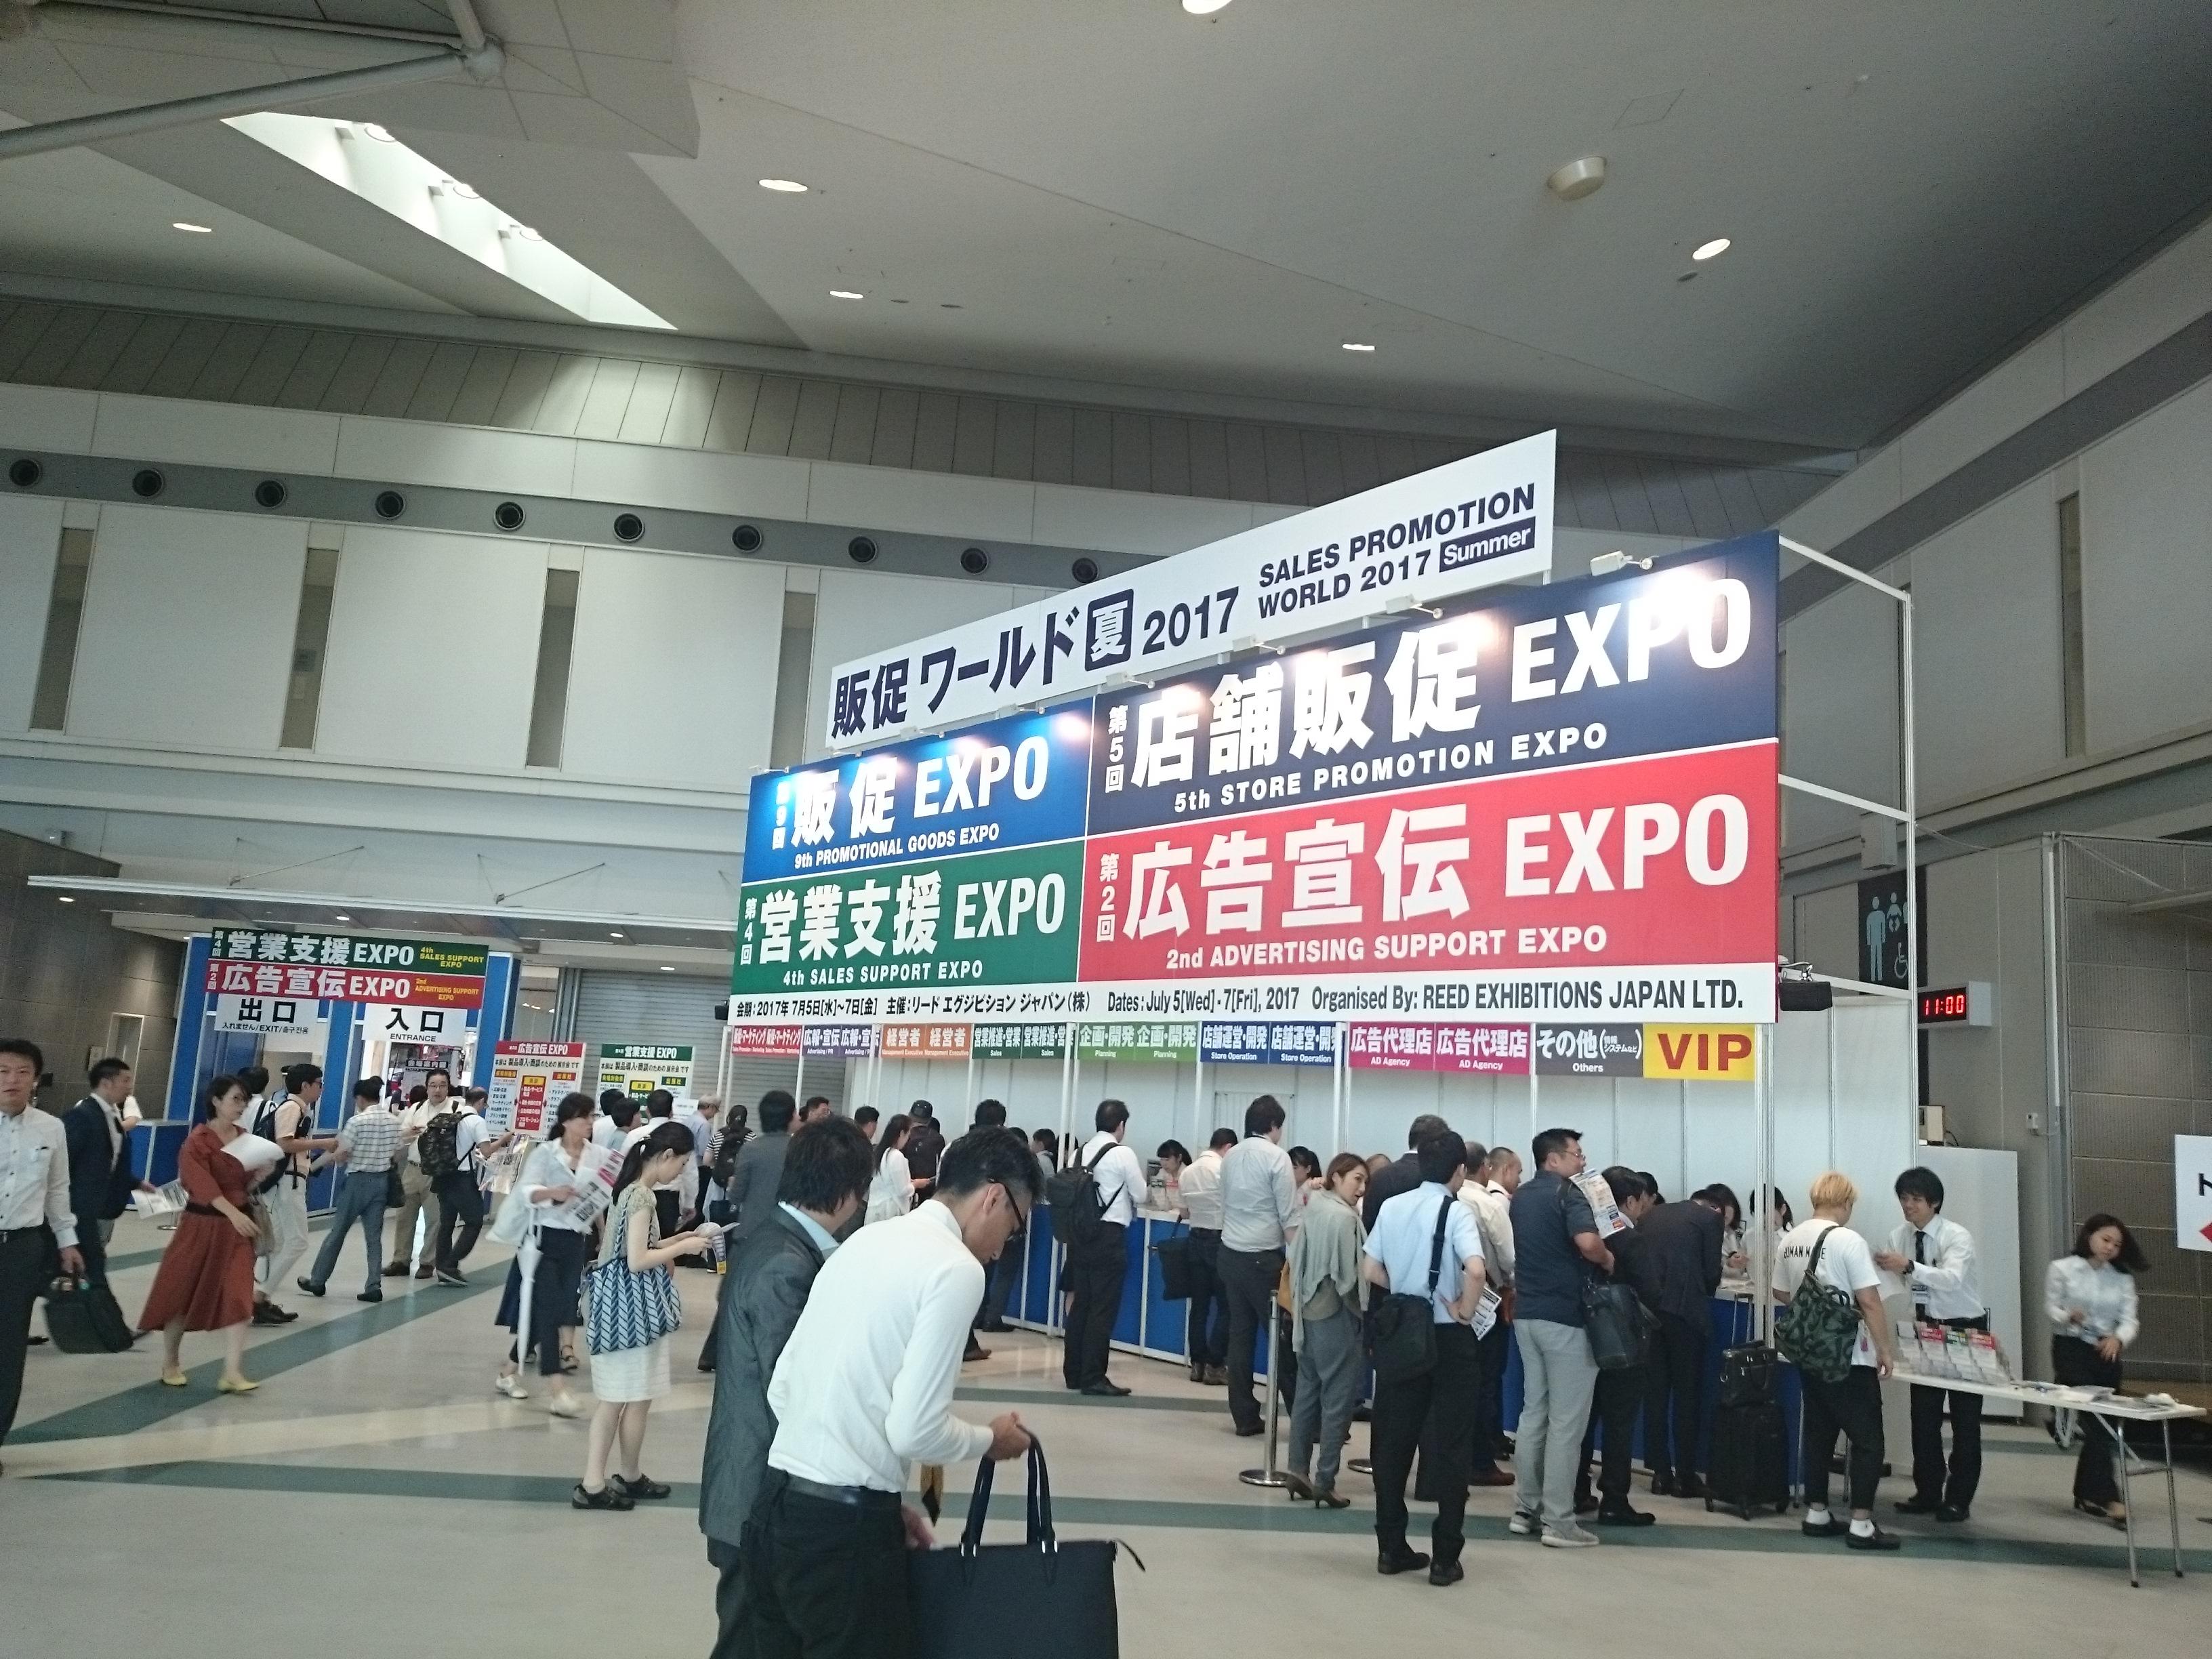 第9回 販促EXPO 夏